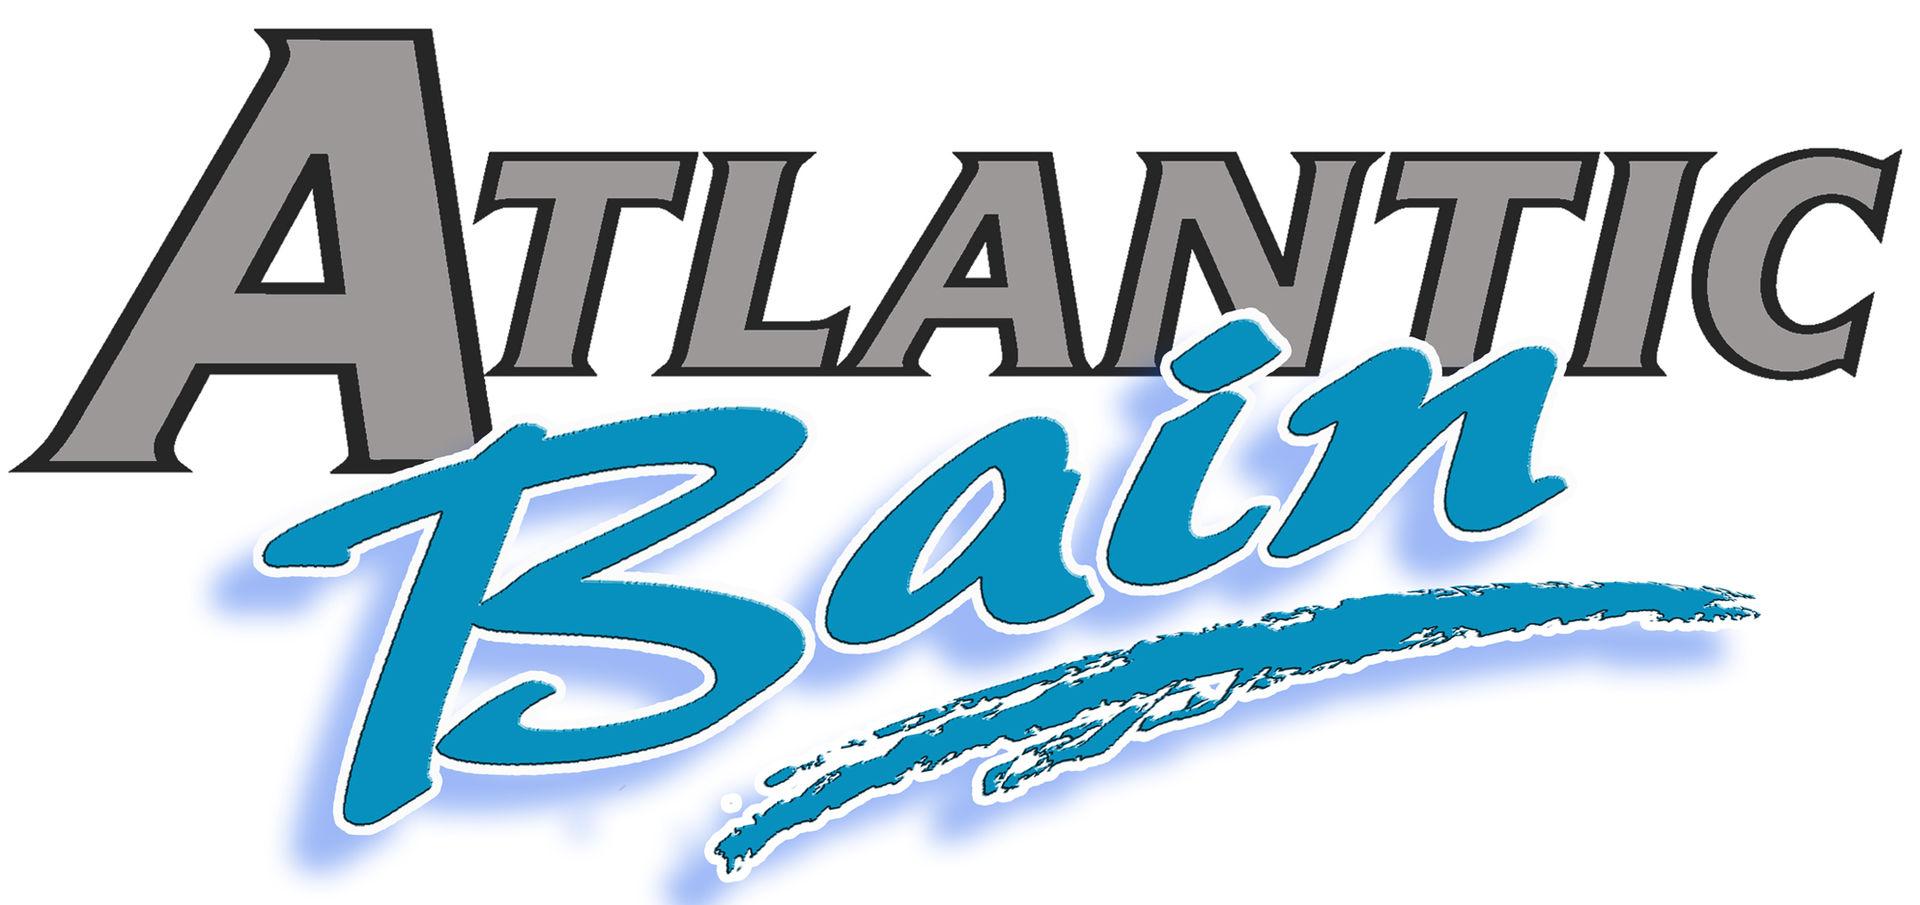 Atlantic Bain Morisseau Vertou meuble vasque béton ciréatlantic bain   homify